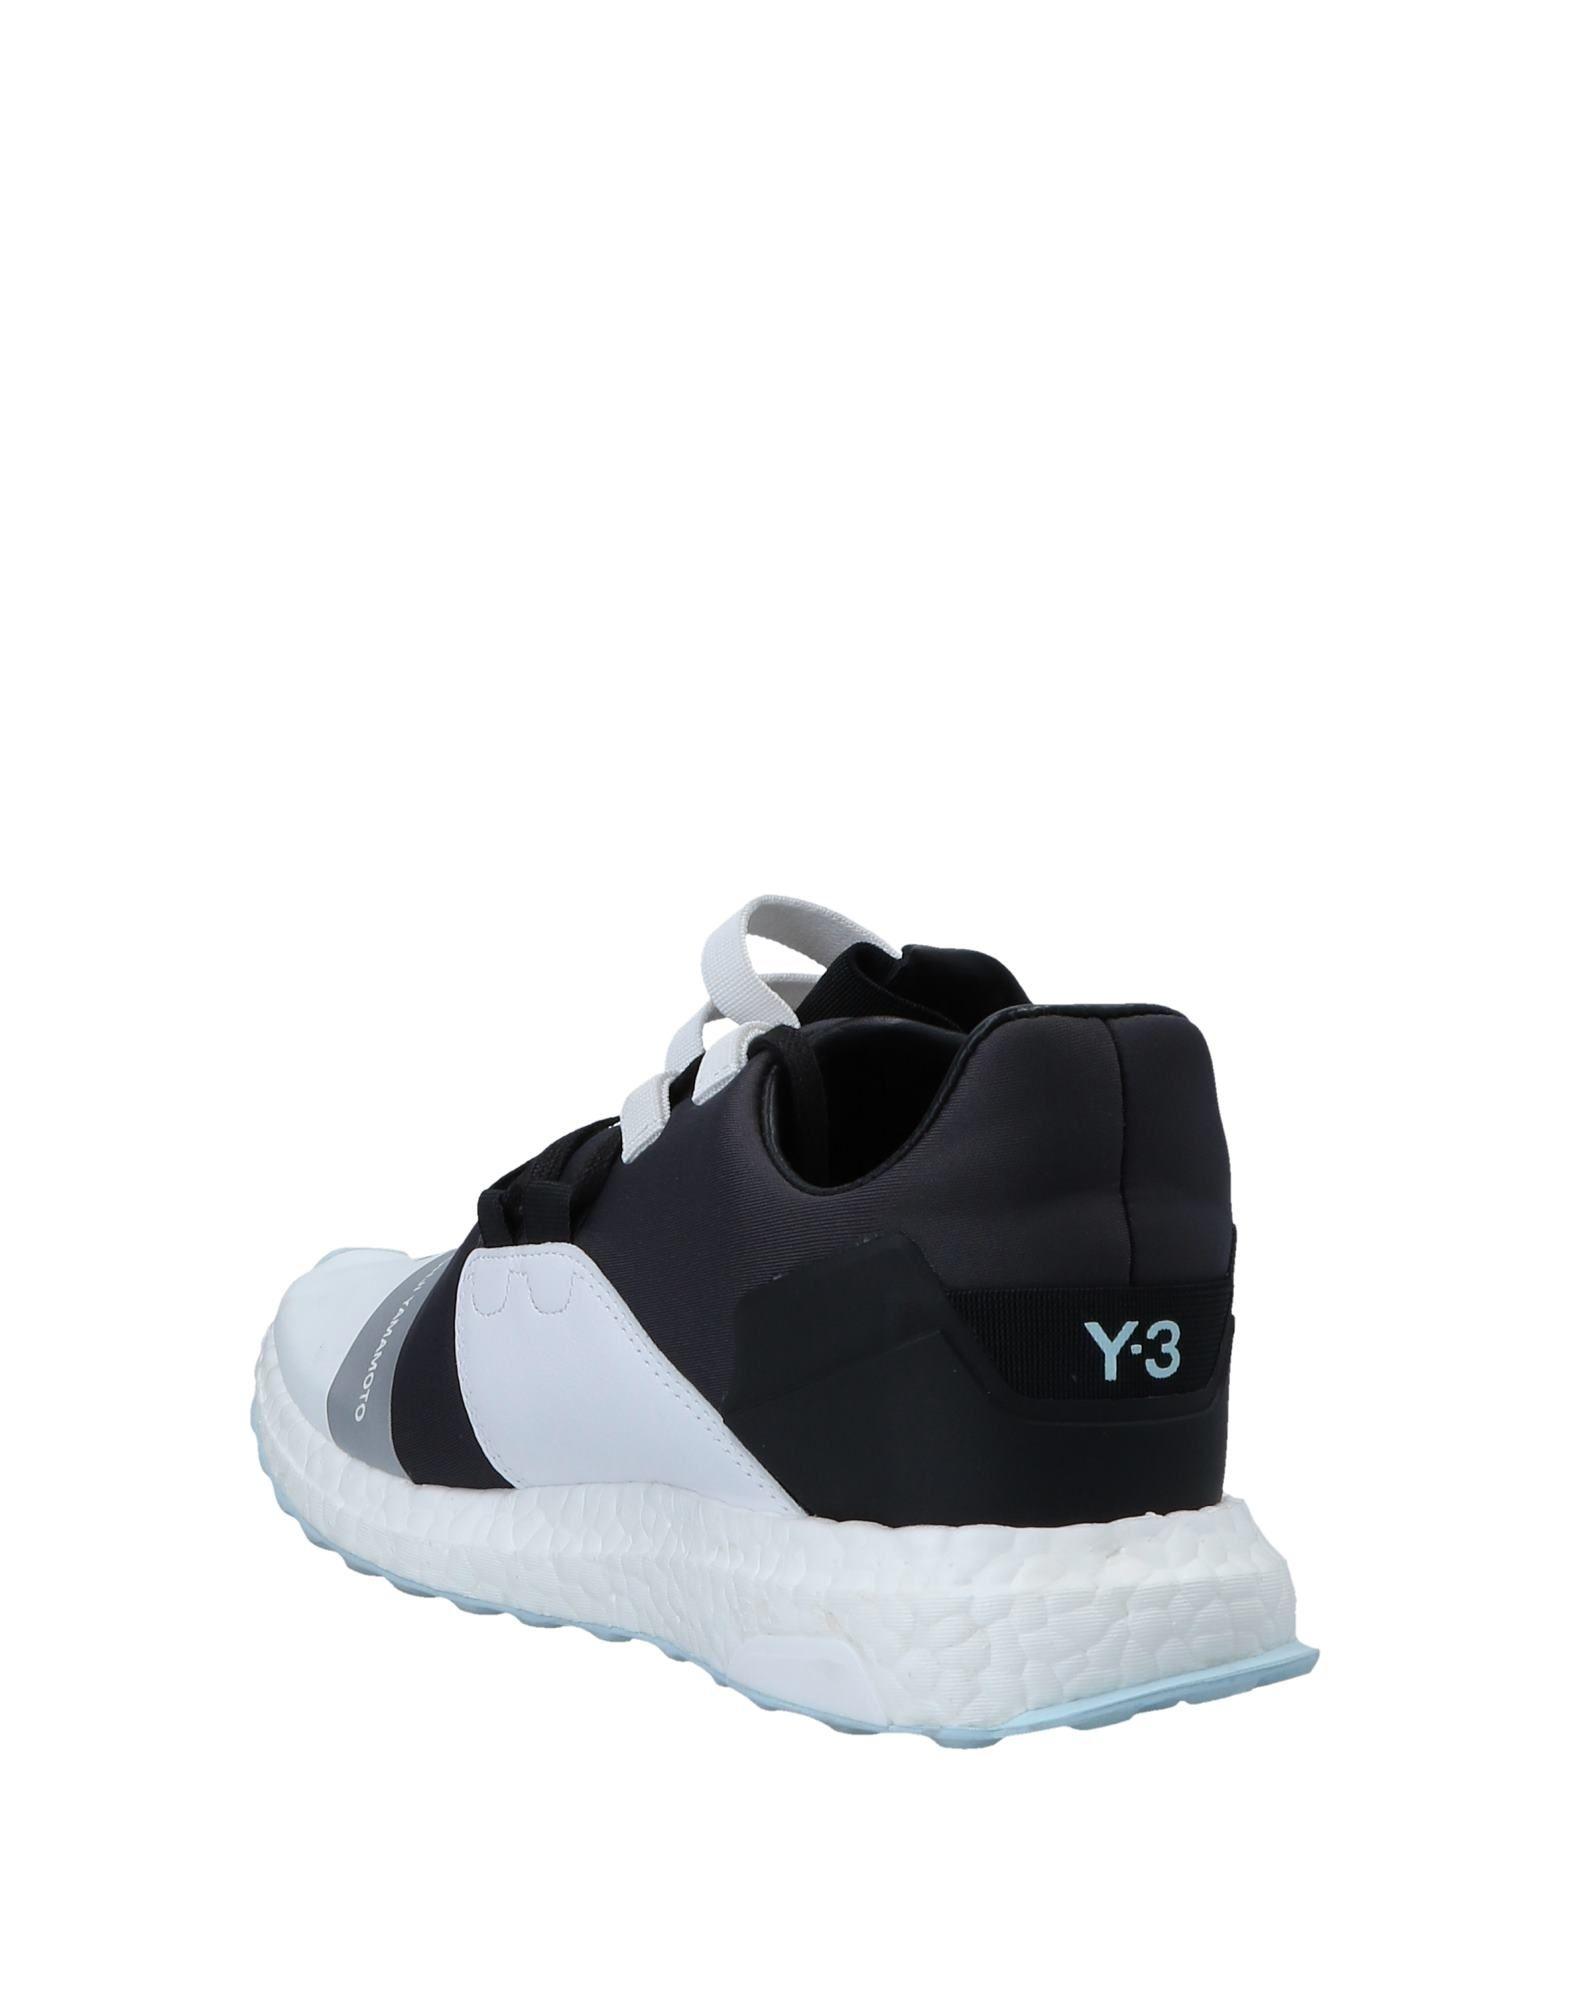 Bdidas By Preis-Leistungs-Verhältnis, Yohji Yamamoto Sneakers Herren Gutes Preis-Leistungs-Verhältnis, By es lohnt sich,Billig-9680 2fd4f2